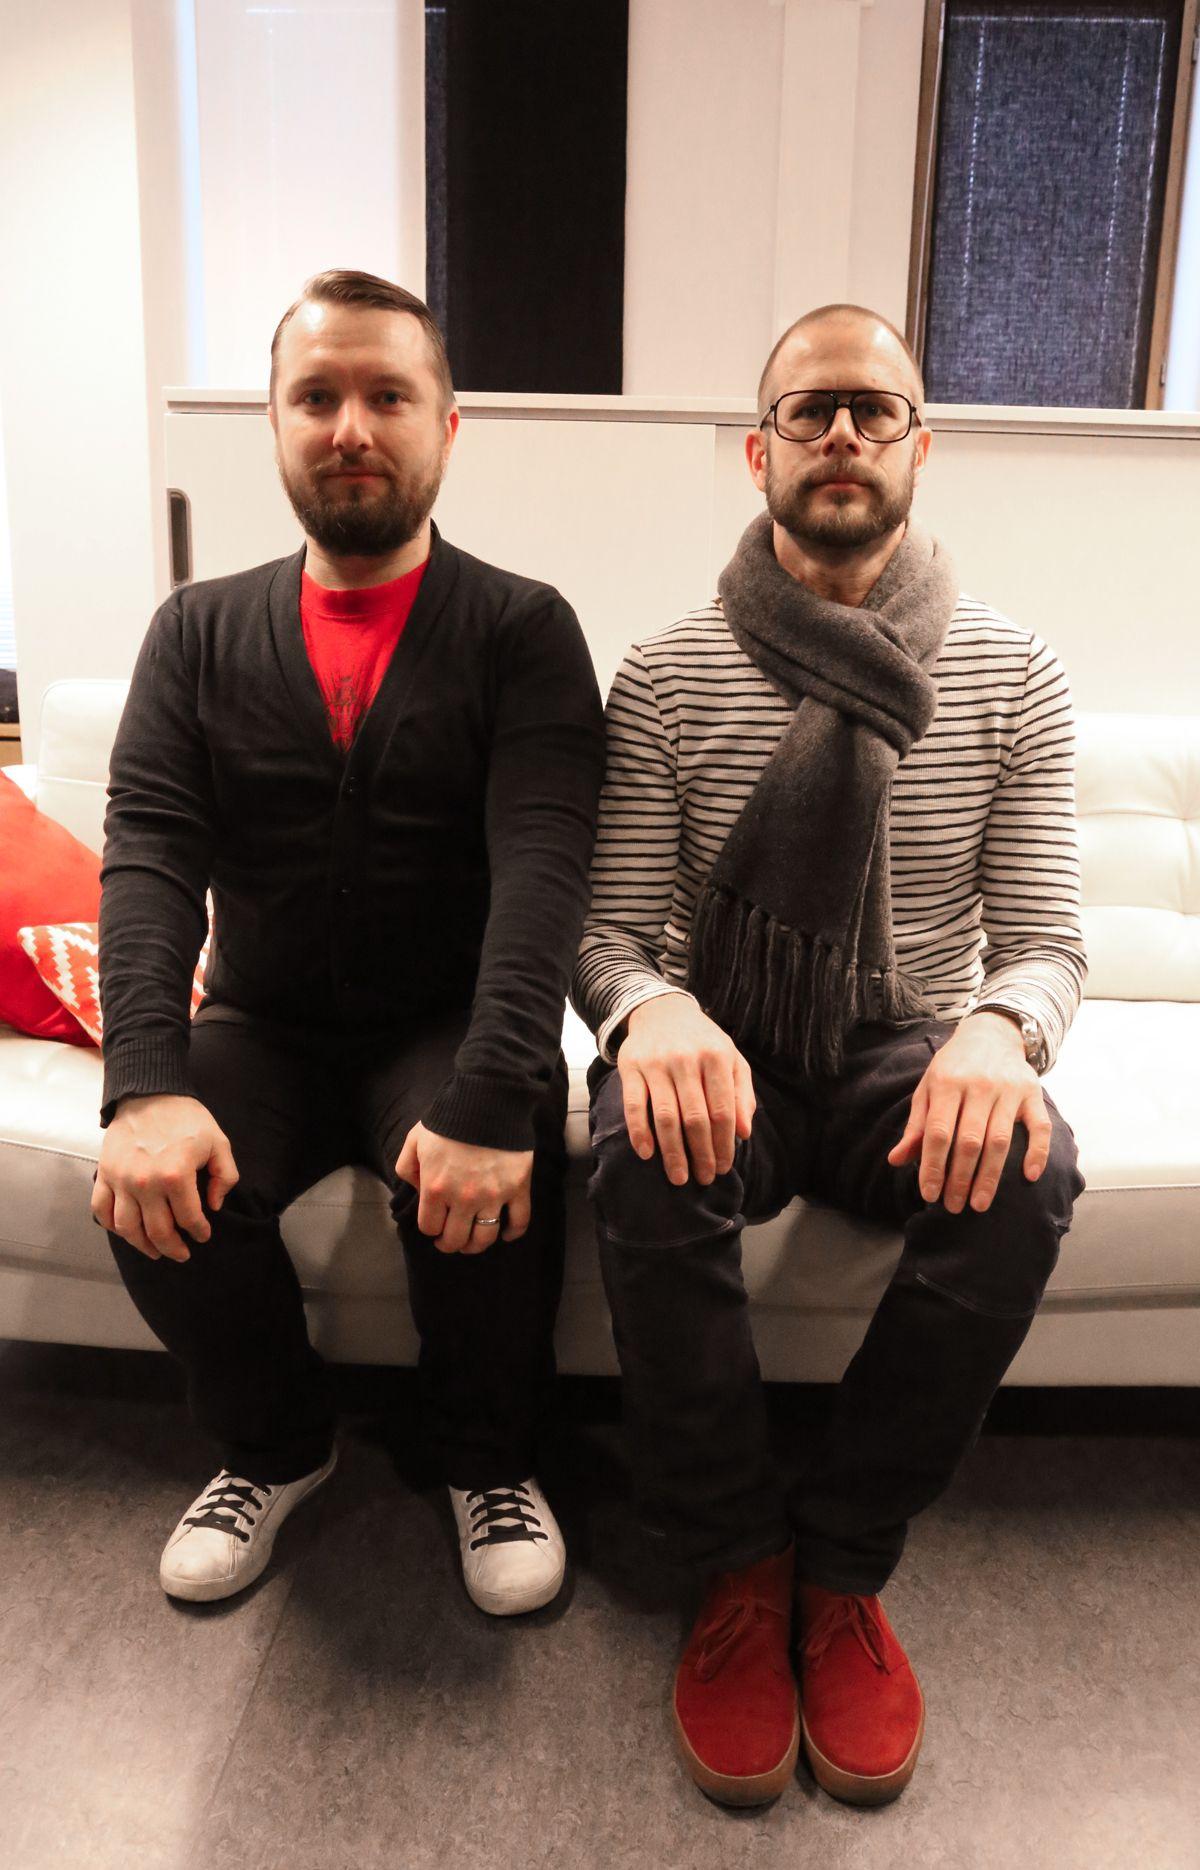 Copywriter-Concept Designer Janne Vahvaselkä and Creative Director Jukka Mannila mean serious business.